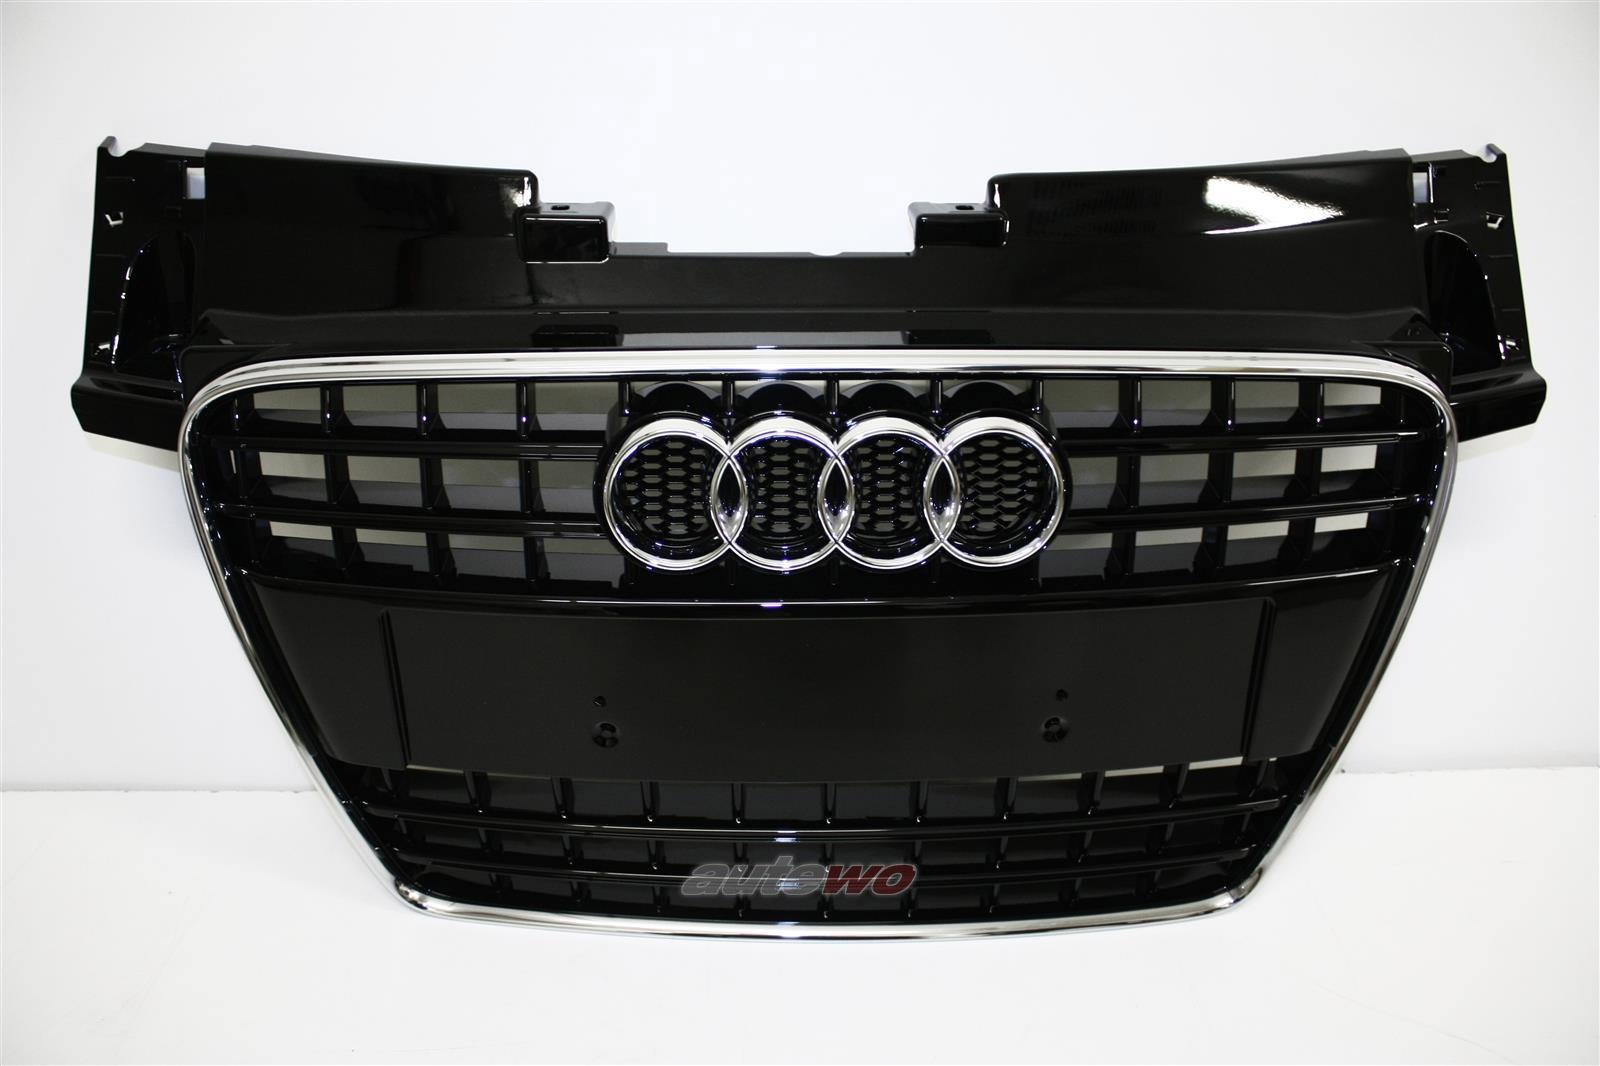 8J0853651 NEU Audi TT 8J Kühlergrill S-Line LY9B Brilliantschwarz